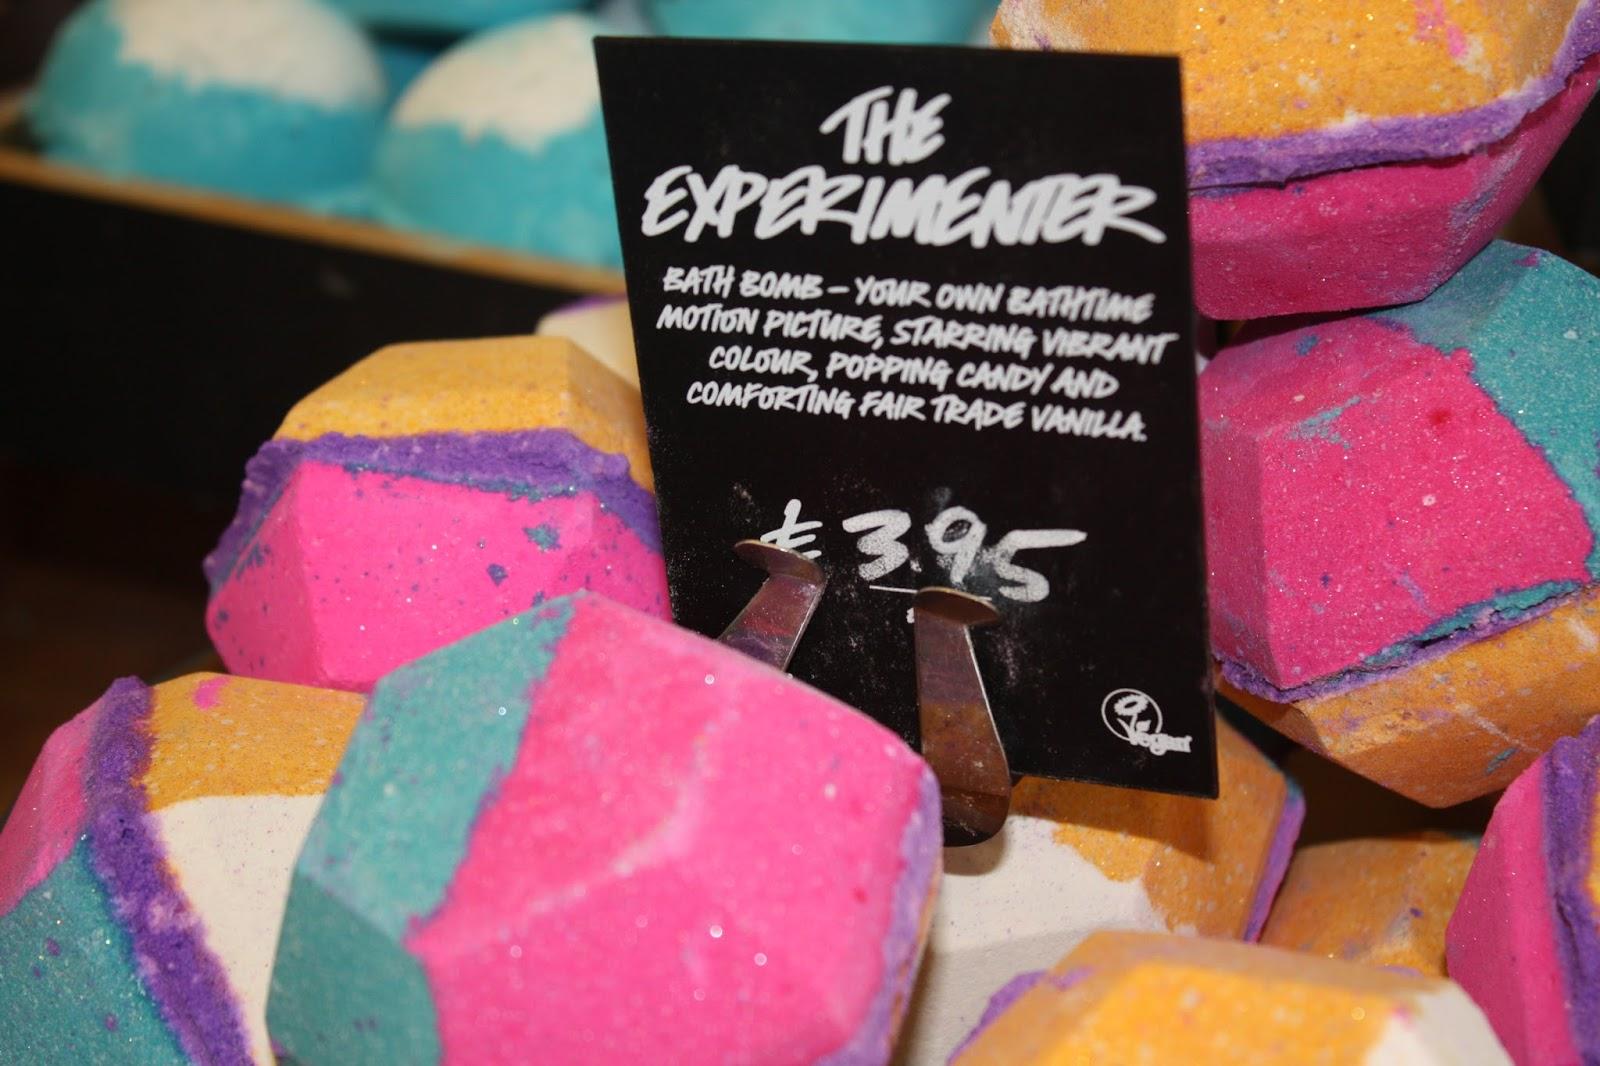 Lush Summer Event Oxford Street Launch The Experimenter Bath Bomb